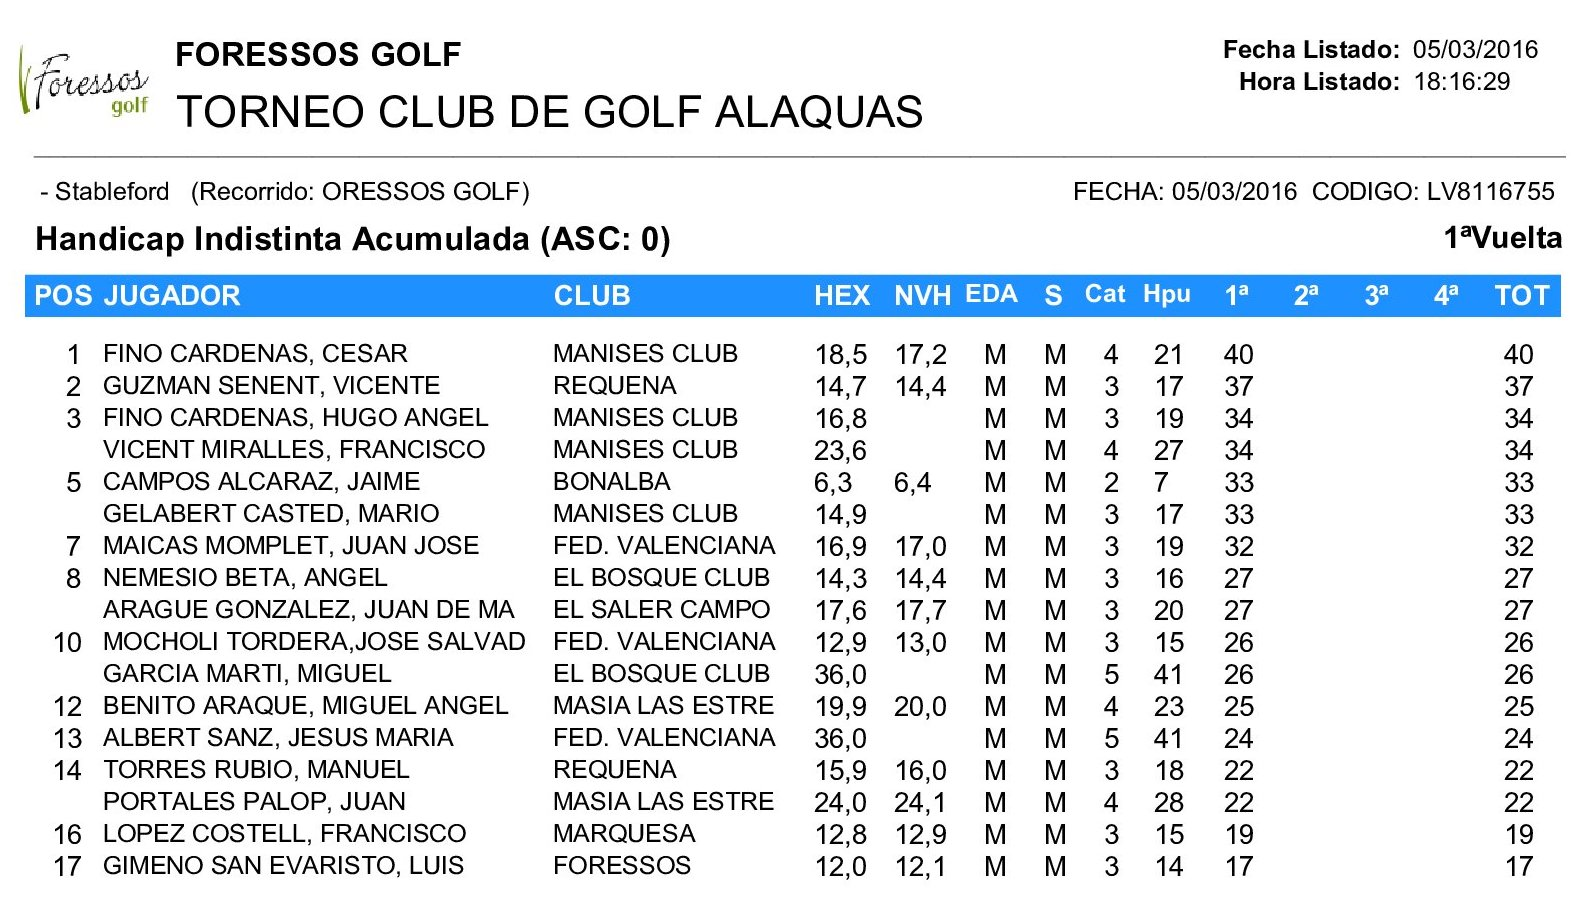 CLASIFICACION_TORNEO_CLUB_DE_GOLF_ALAQUAS